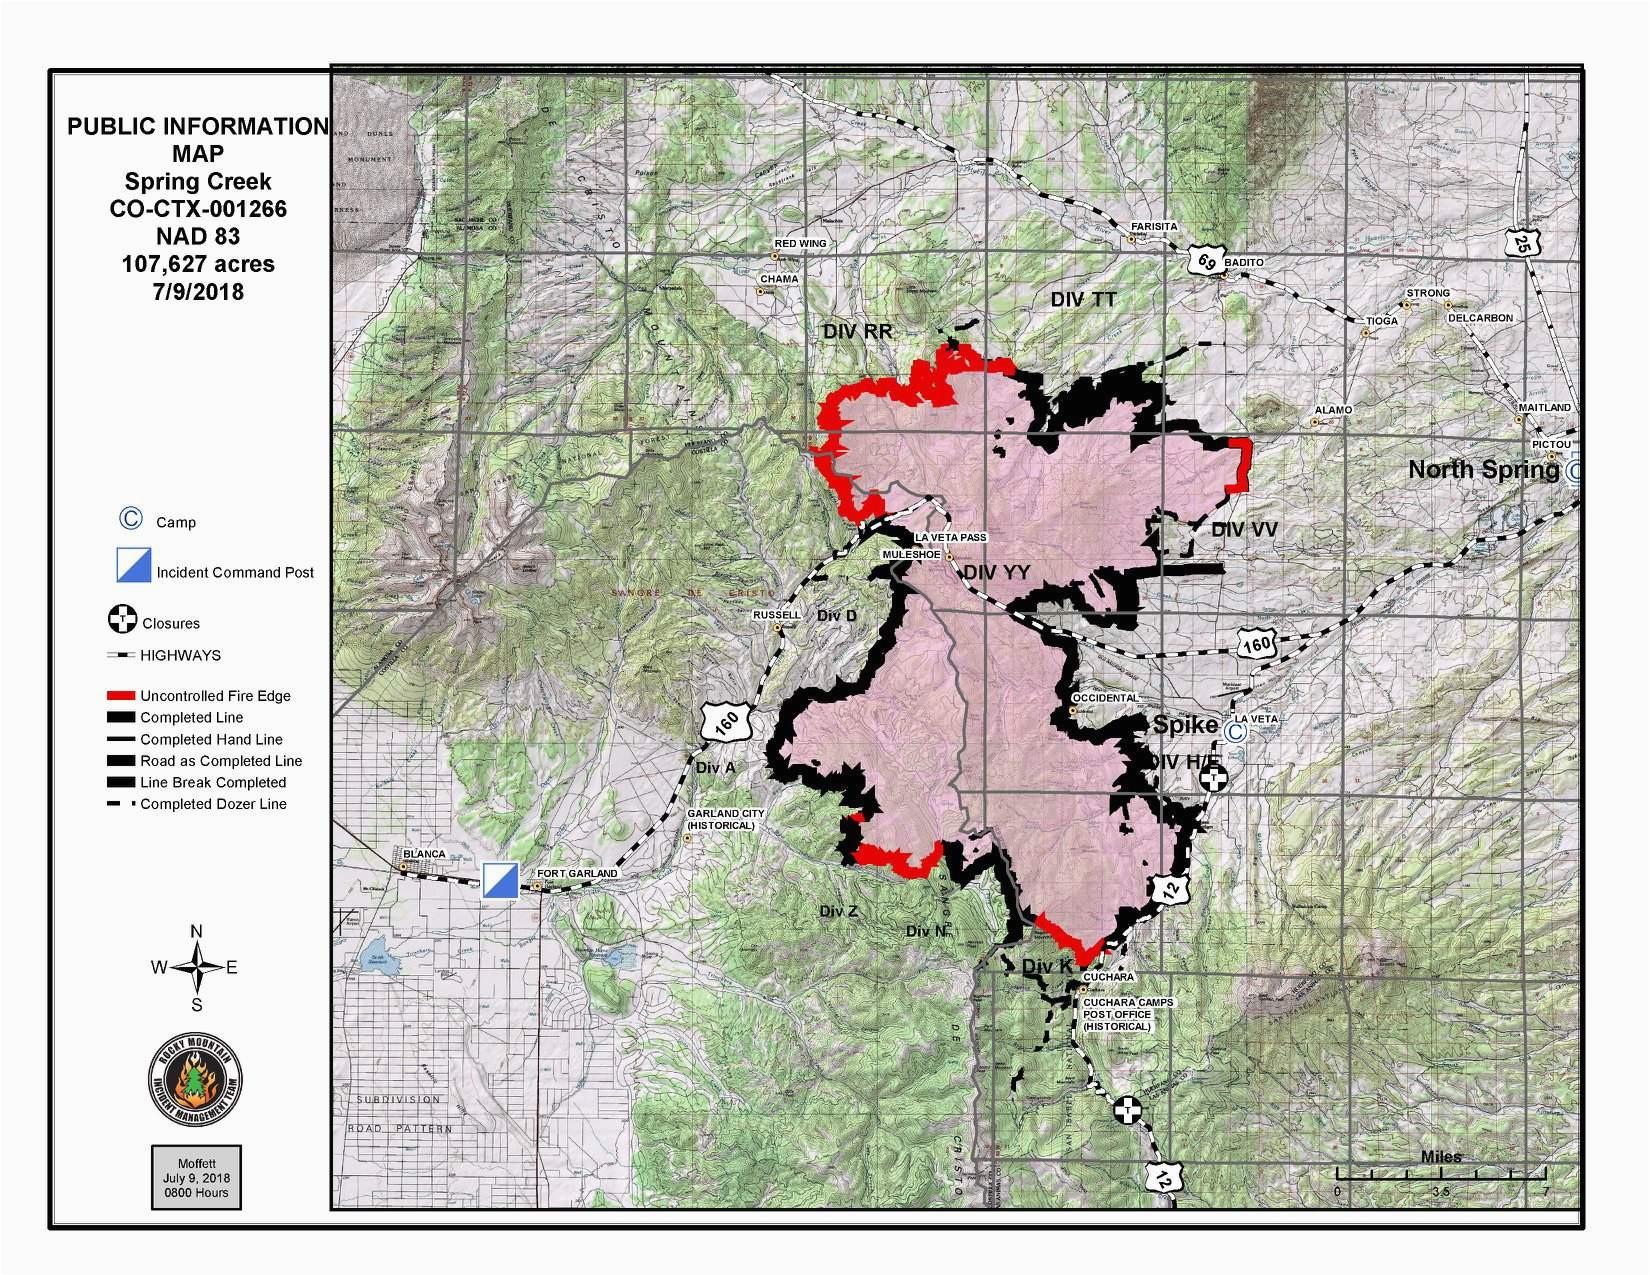 Colorado Fire Ban Map Colorado Fire Maps Fires Near Me Right now July 10 Heavy Com